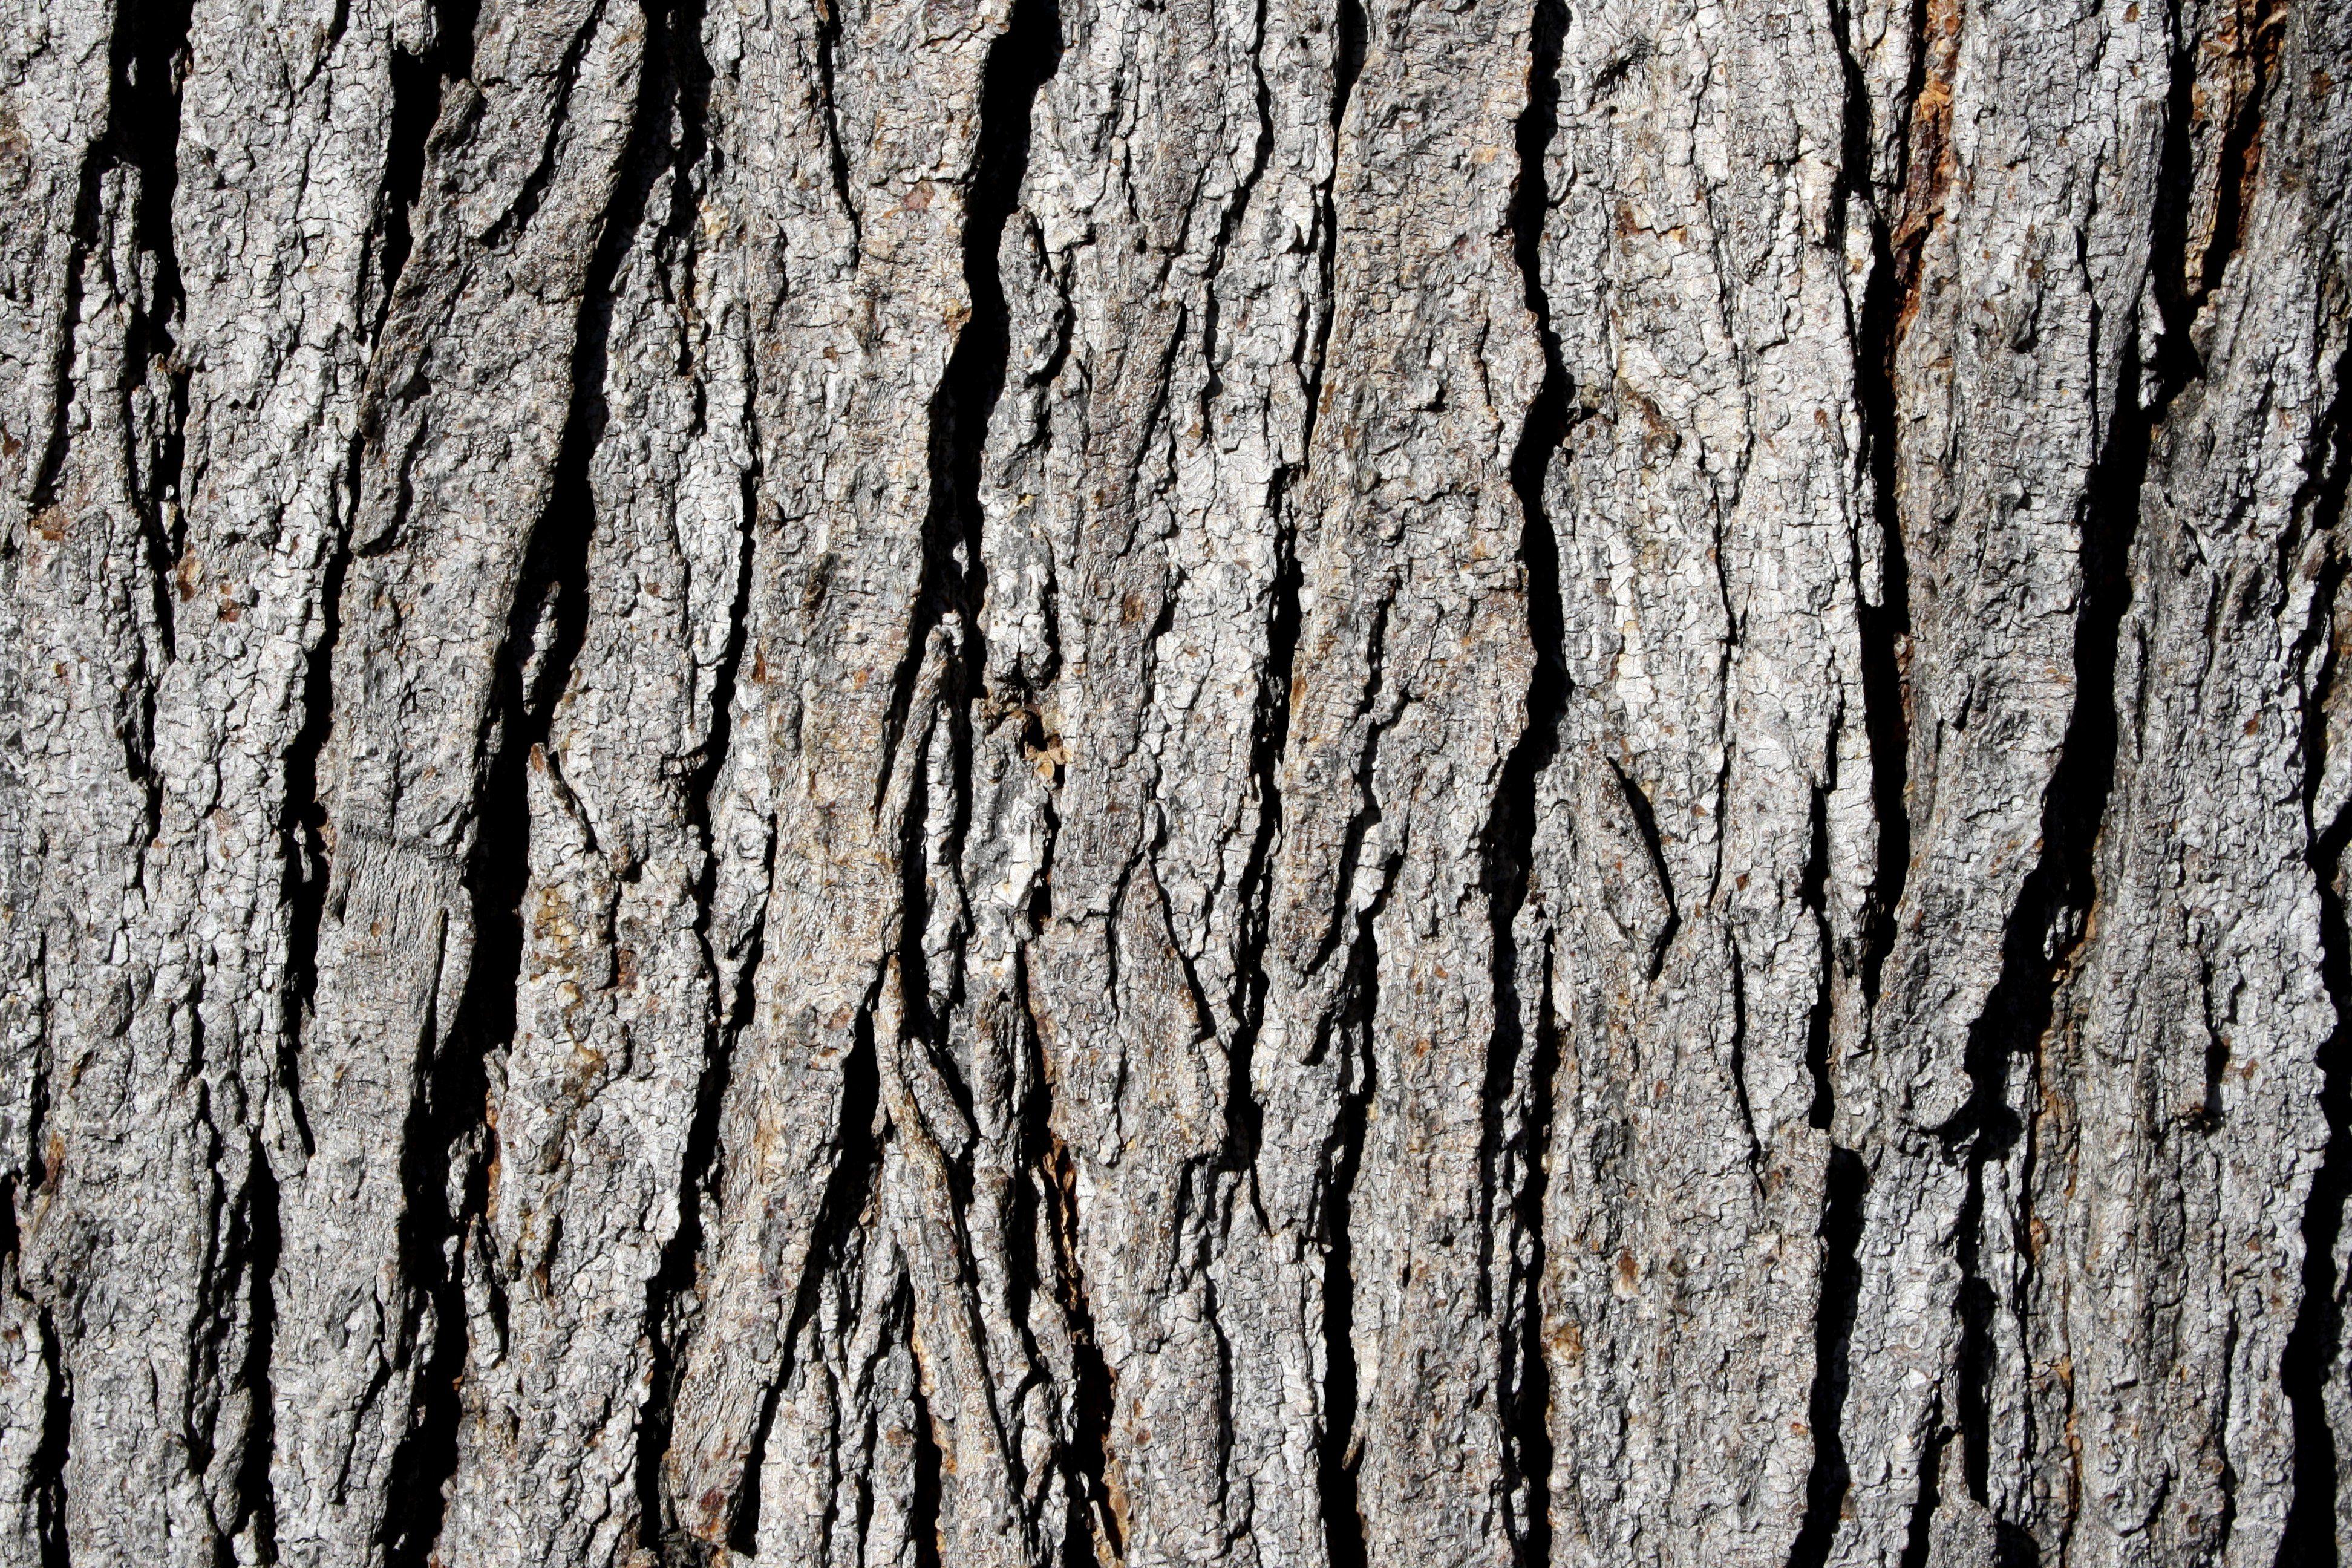 pin by kimberly wies on outdoors tree tree tree